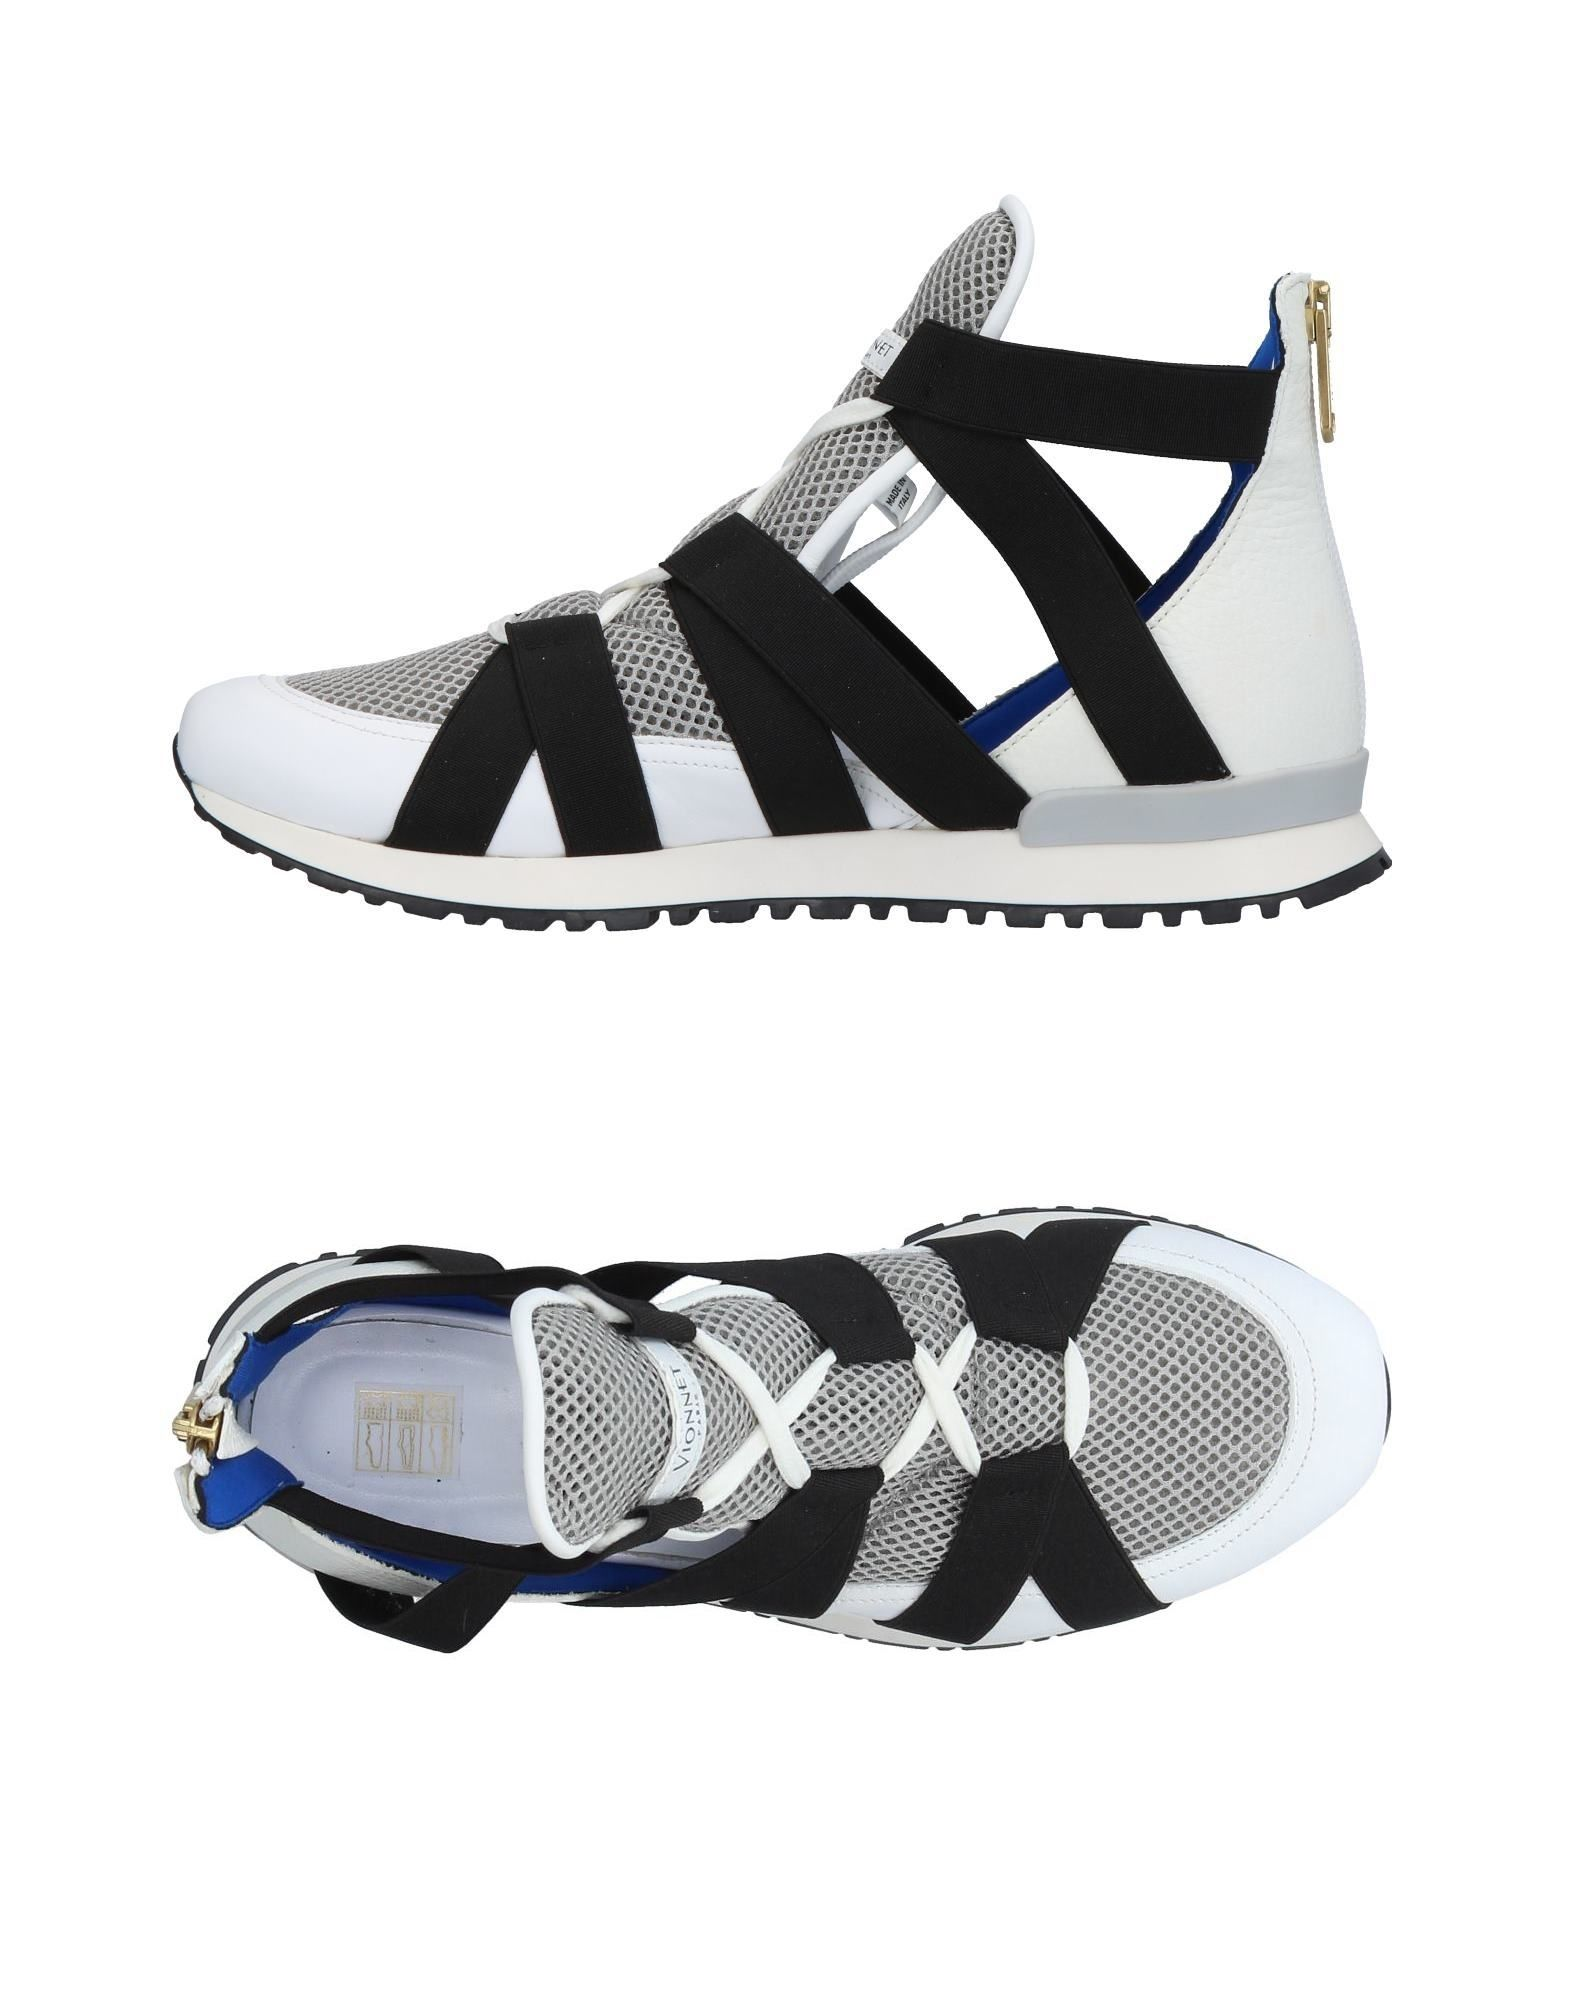 Moda Sneakers Vionnet Donna Donna Vionnet - 11360392OW a7206f